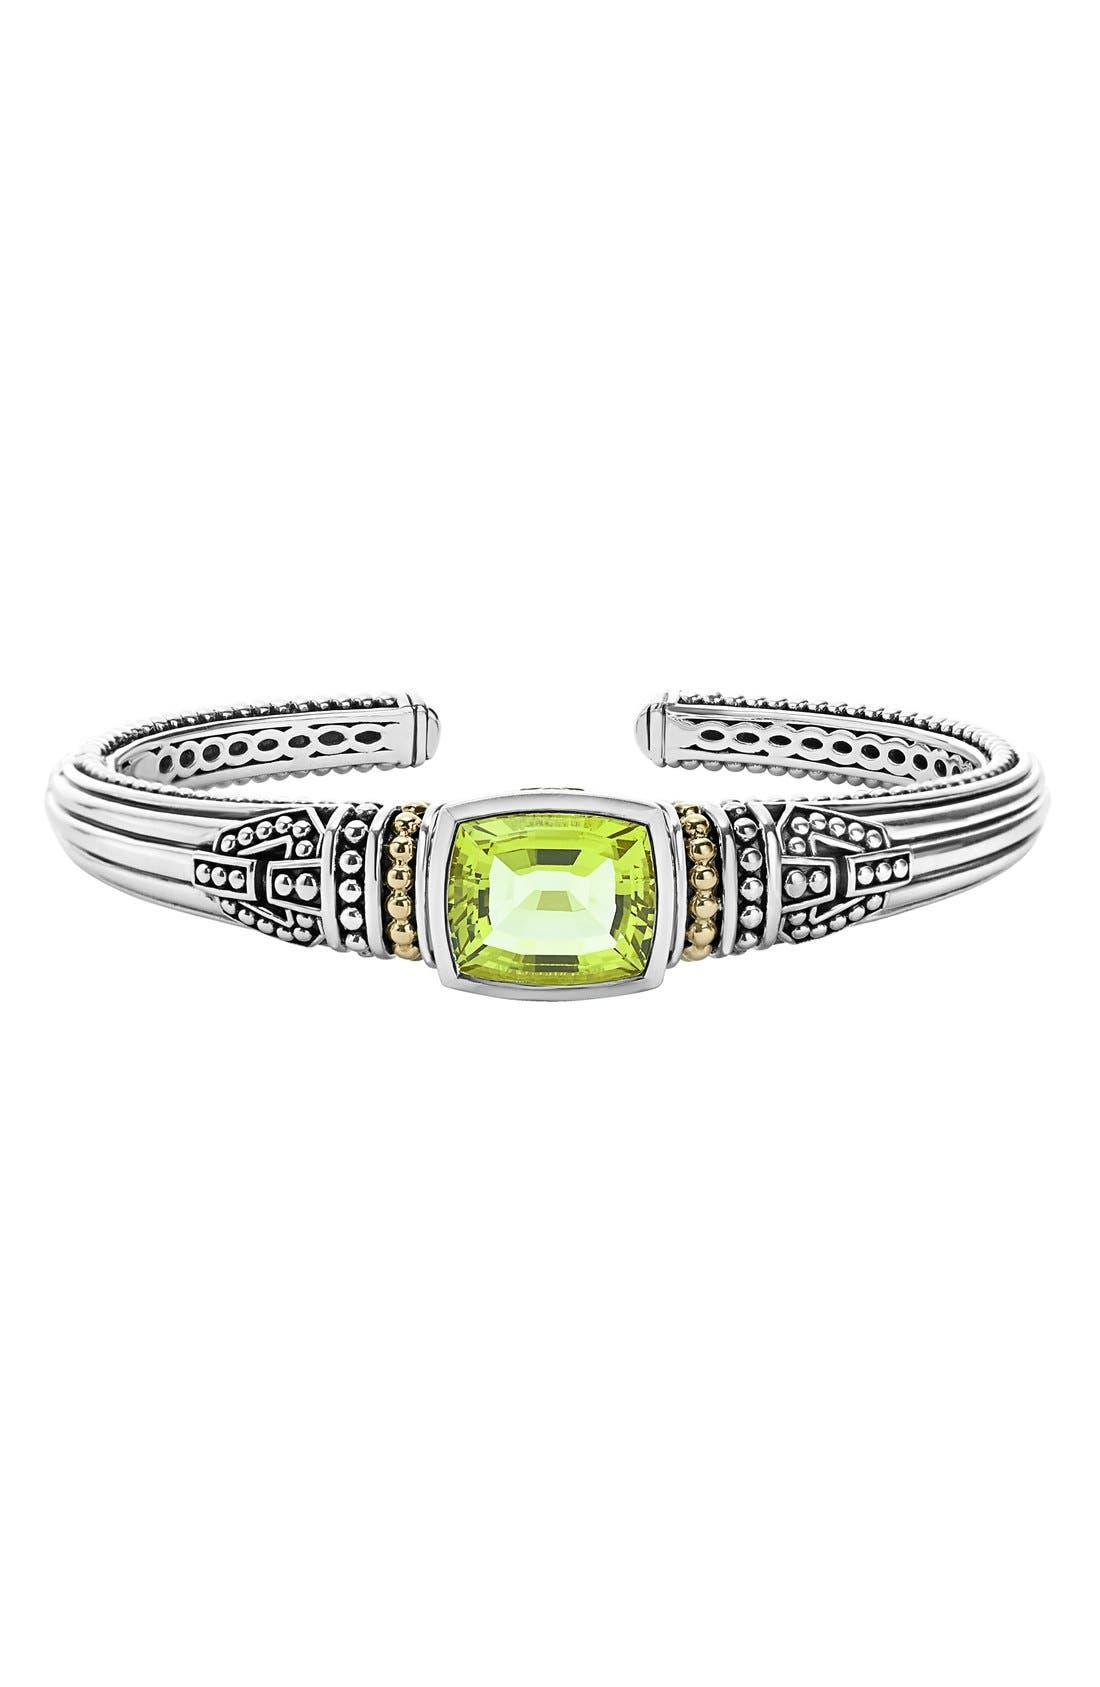 Alternate Image 1 Selected - LAGOS 'Caviar Color' Semiprecious Stone Cuff